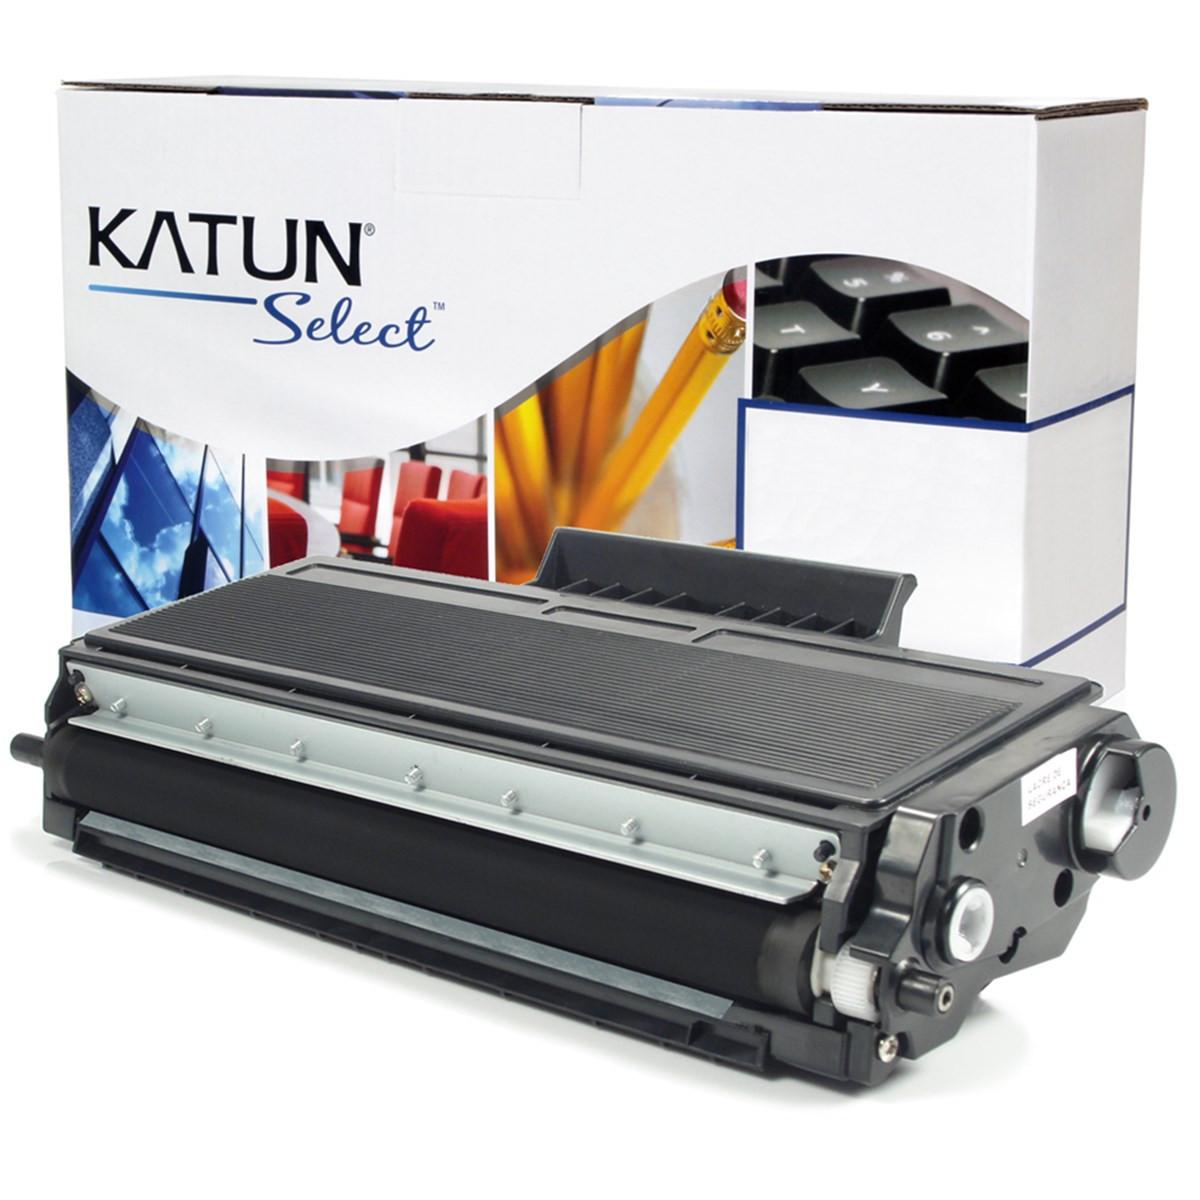 Toner Compatível com Imagistic FX3000 | Katun Select 8k